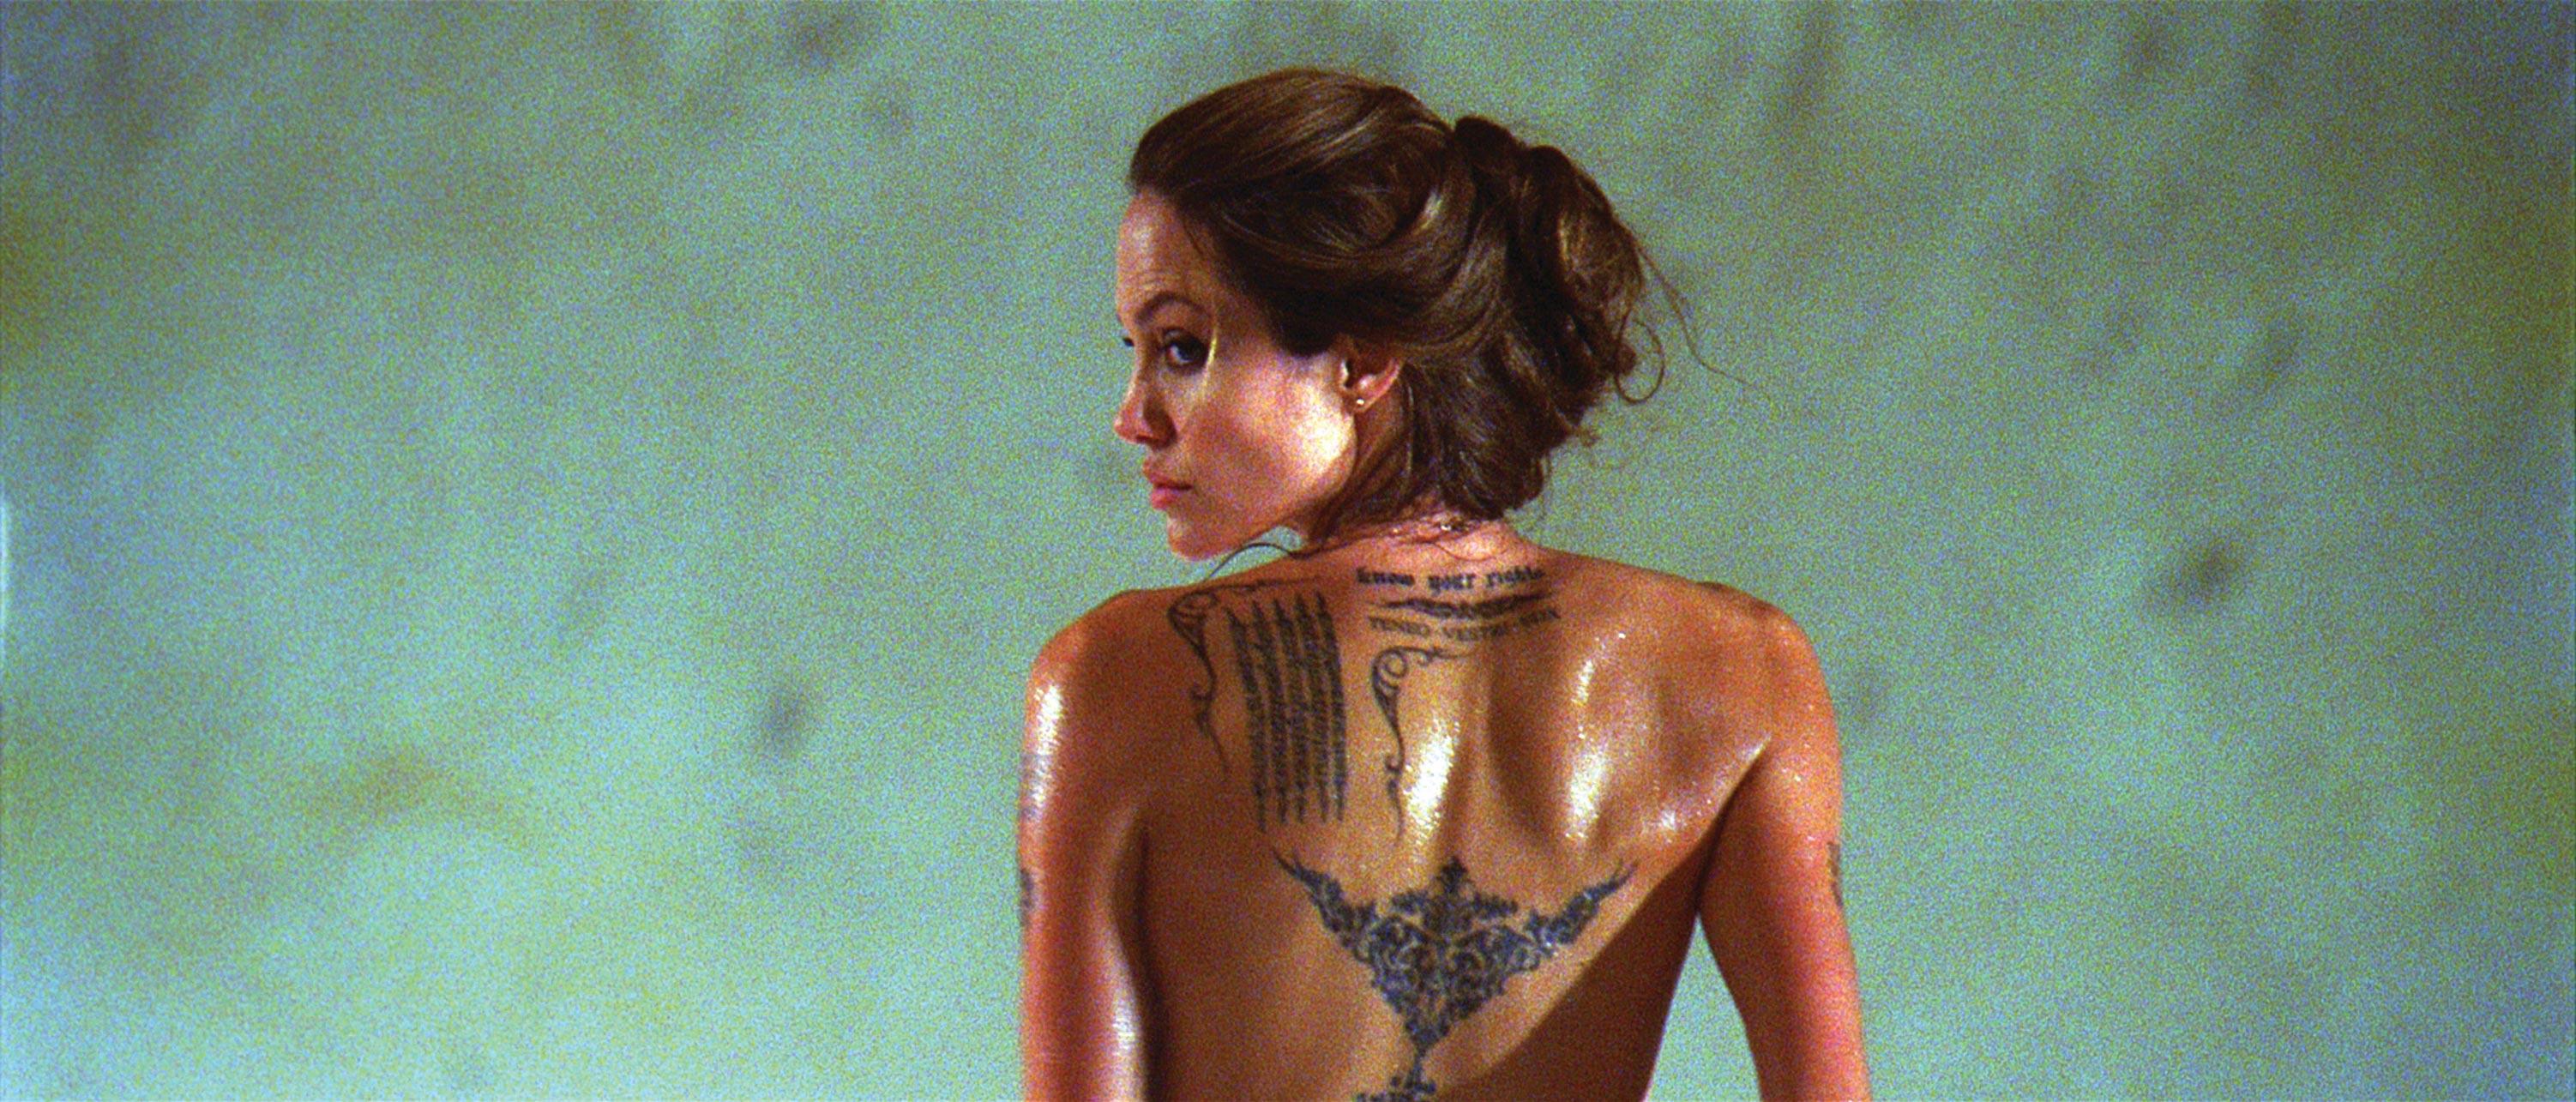 Angelina jolie nude skin hentai scene